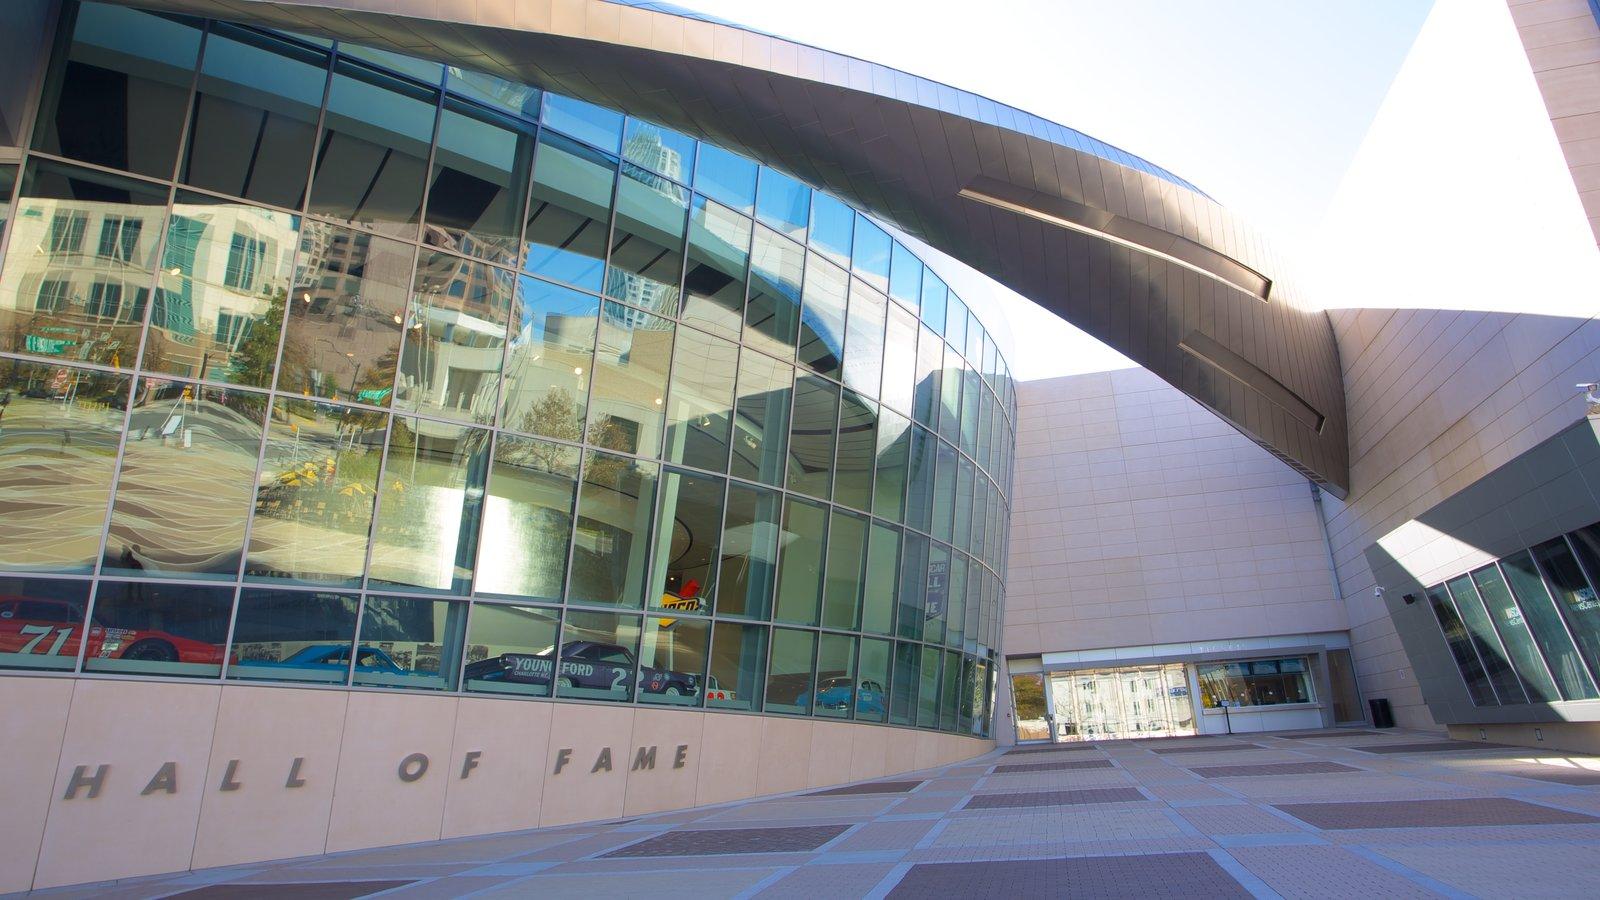 Charlotte caracterizando arquitetura moderna